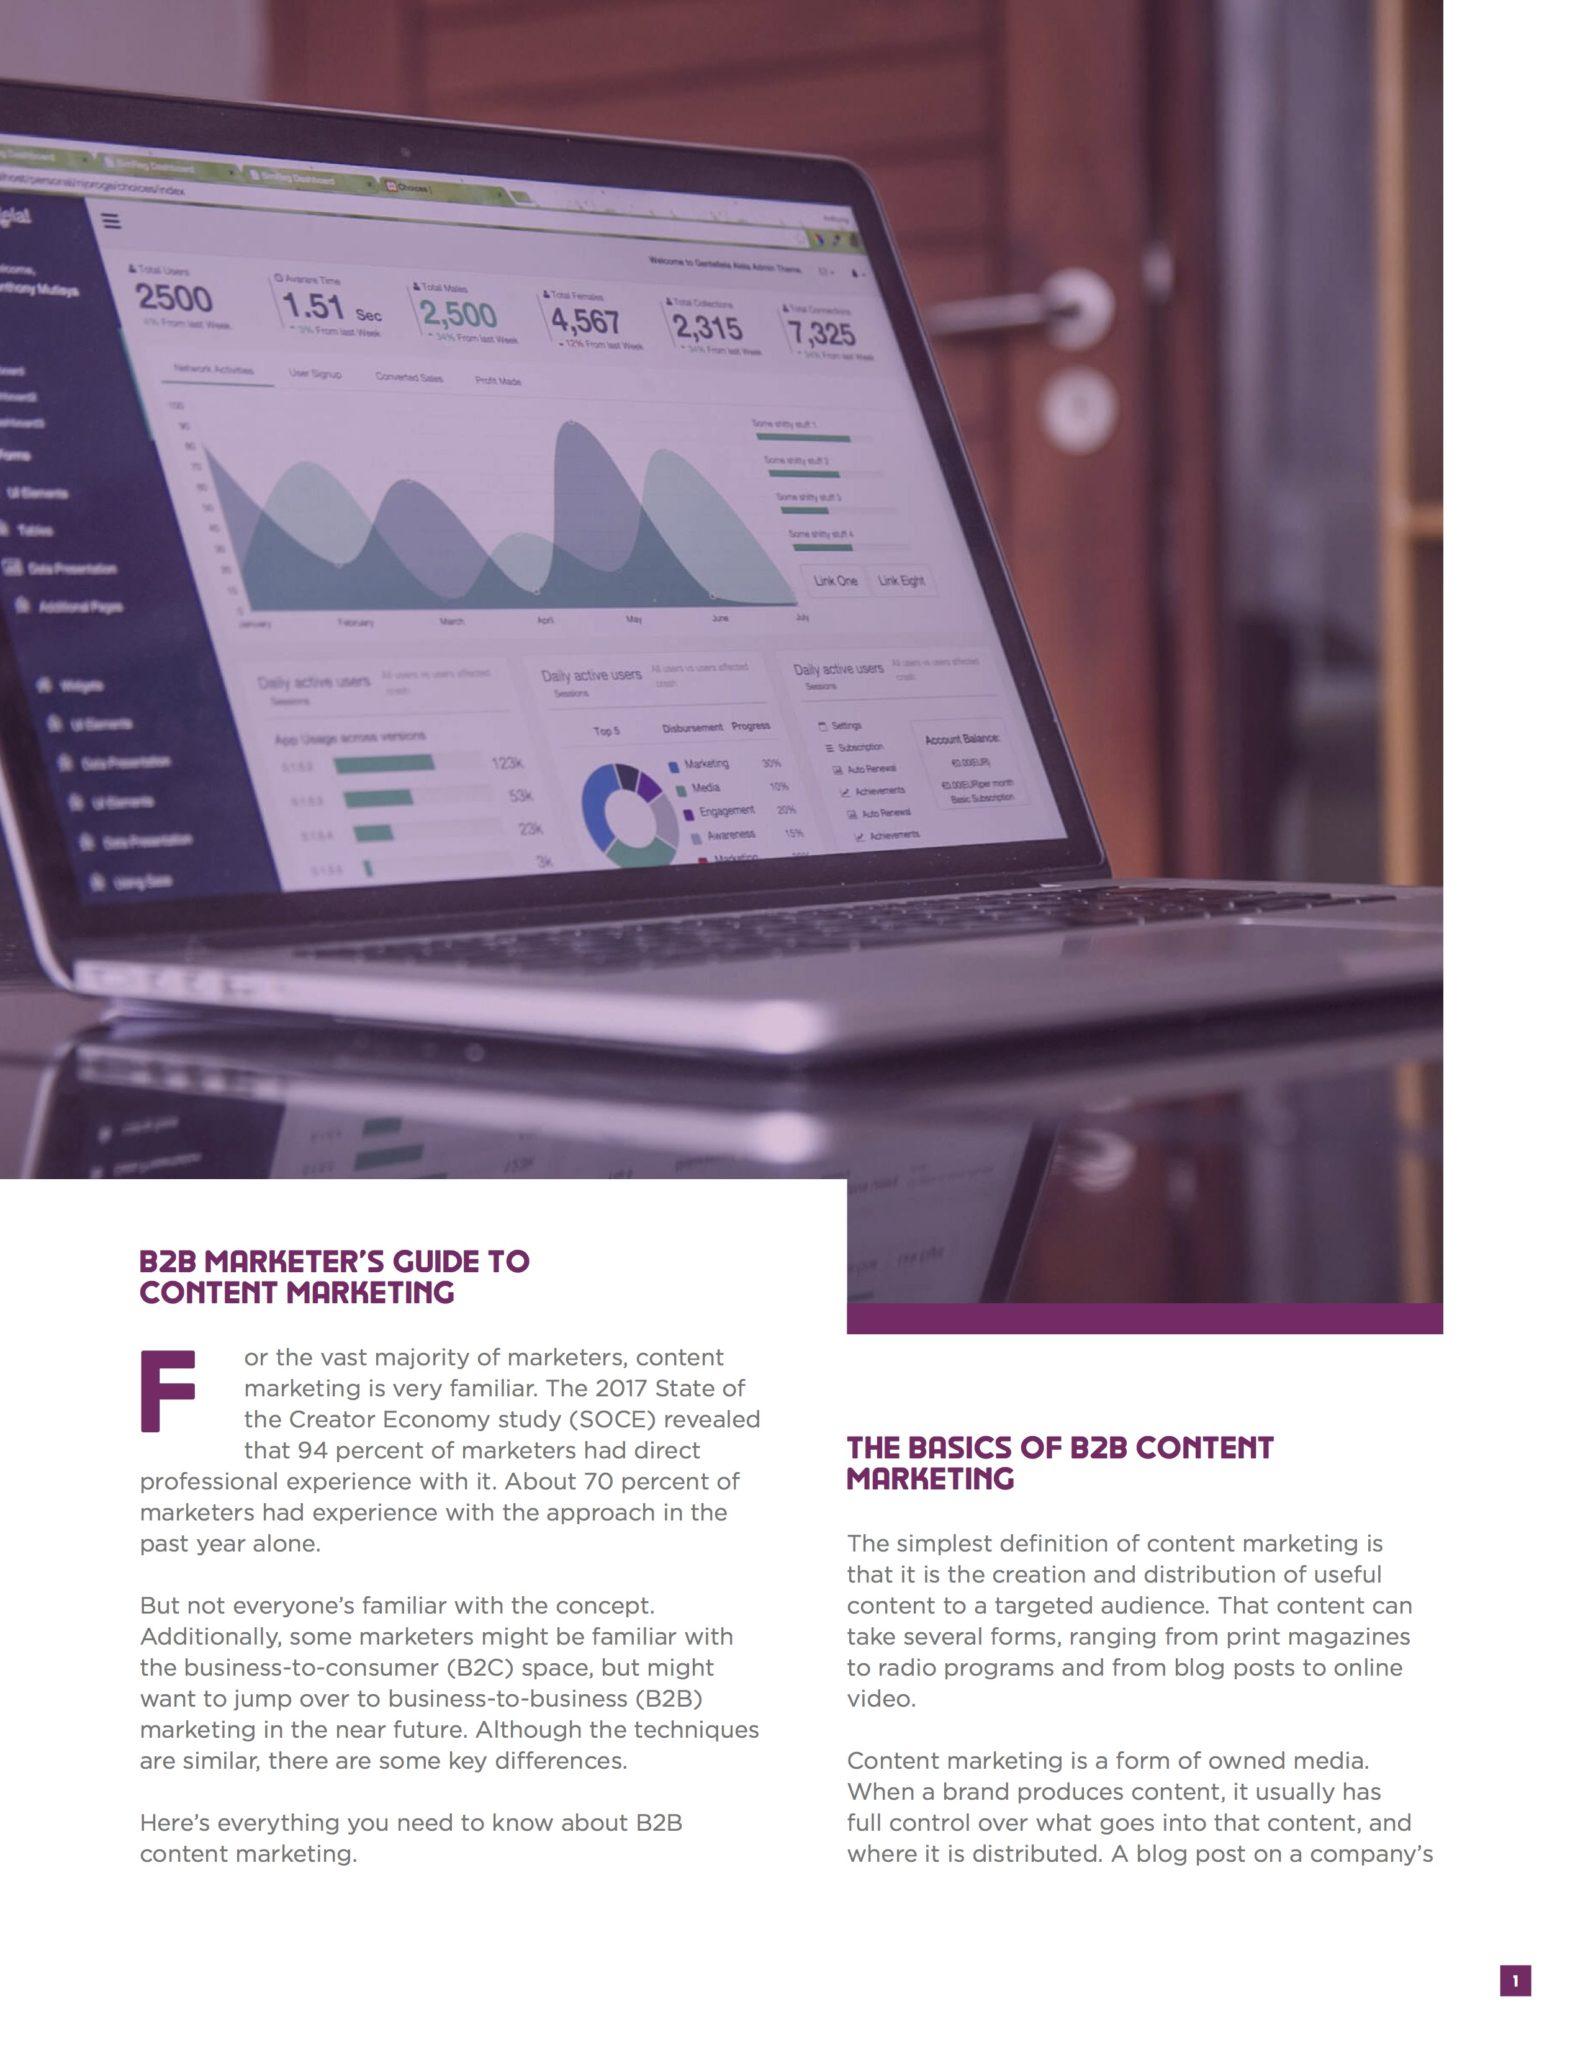 B2B Content Marketing Ebook 1